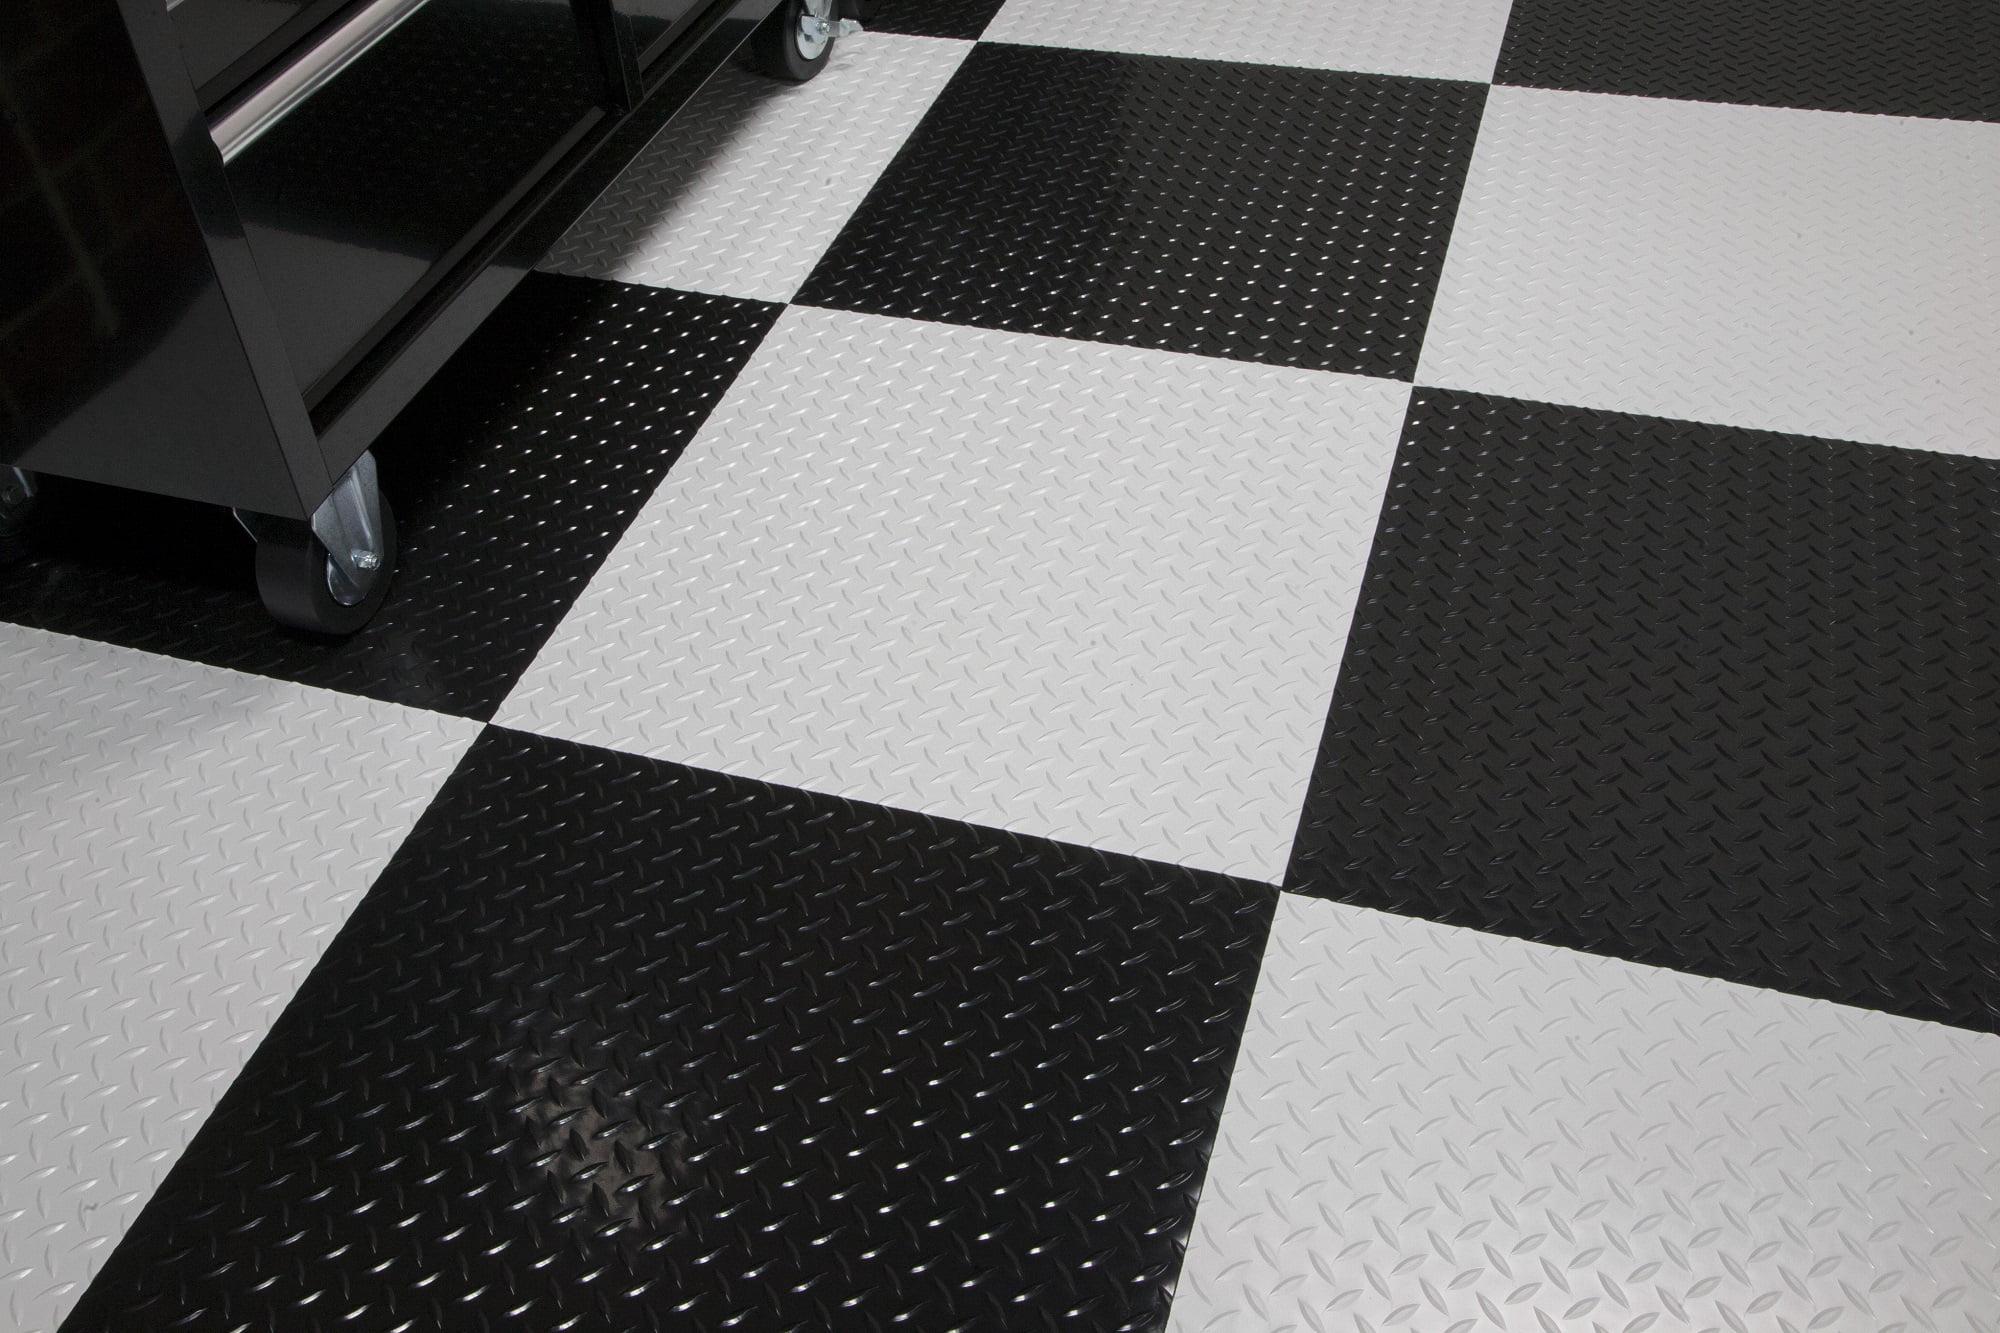 G Floor Raceday Peel And Stick Tile With Psa 95 Mil Diamond Tread 24 X 24 Absolute White 10 Pack Walmart Com Walmart Com